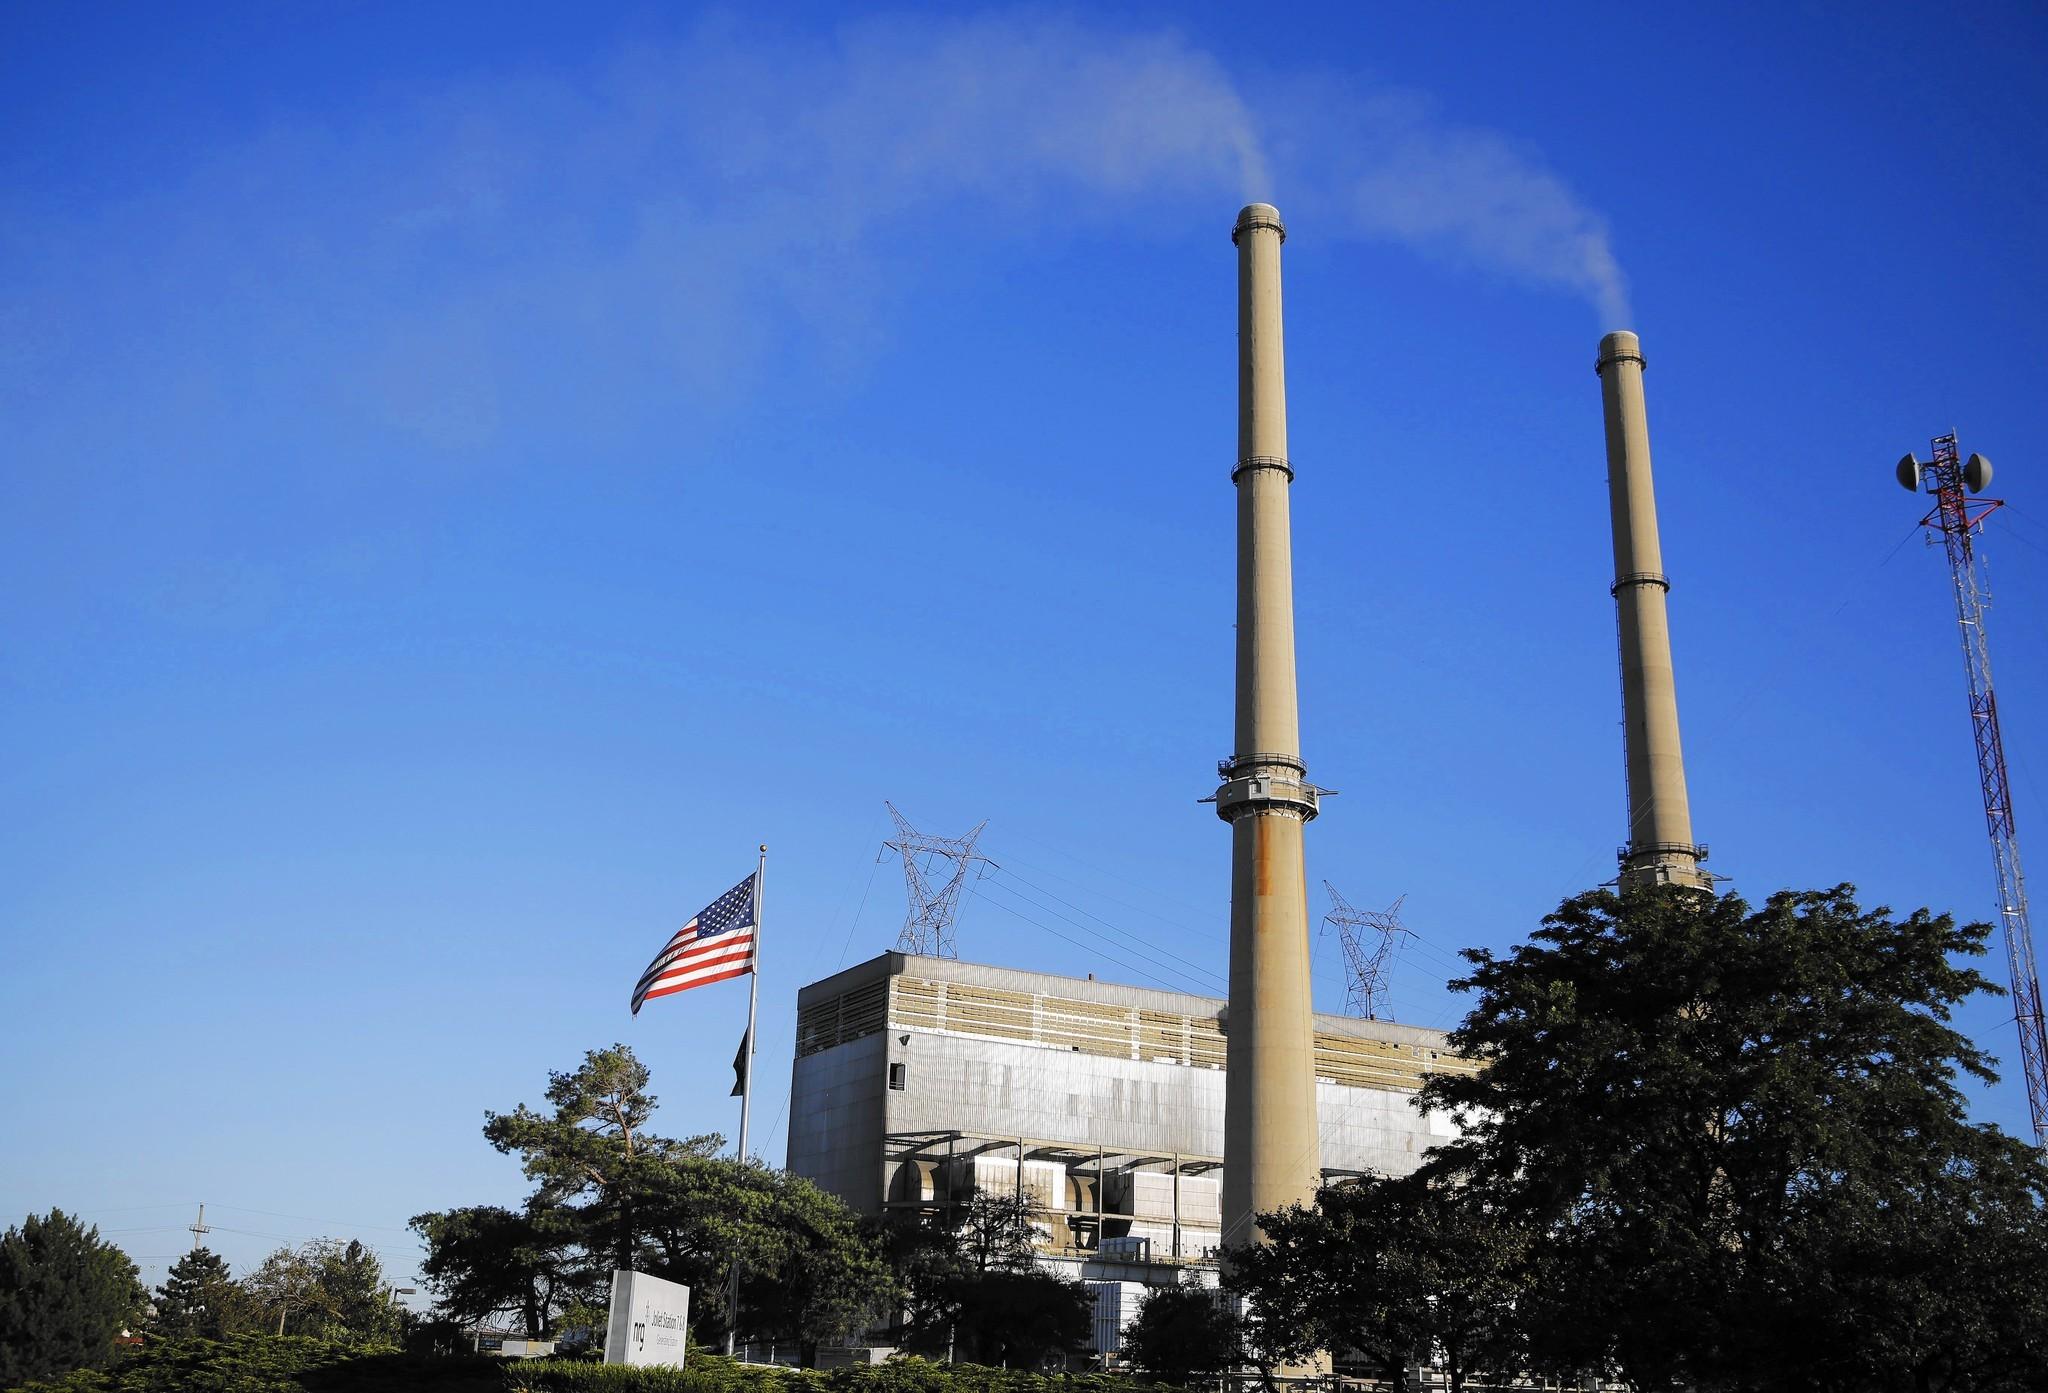 Illinois randolph county baldwin - Obama Unveils Rules To Limit Carbon Dioxide Emissions Curb Climate Change Chicago Tribune